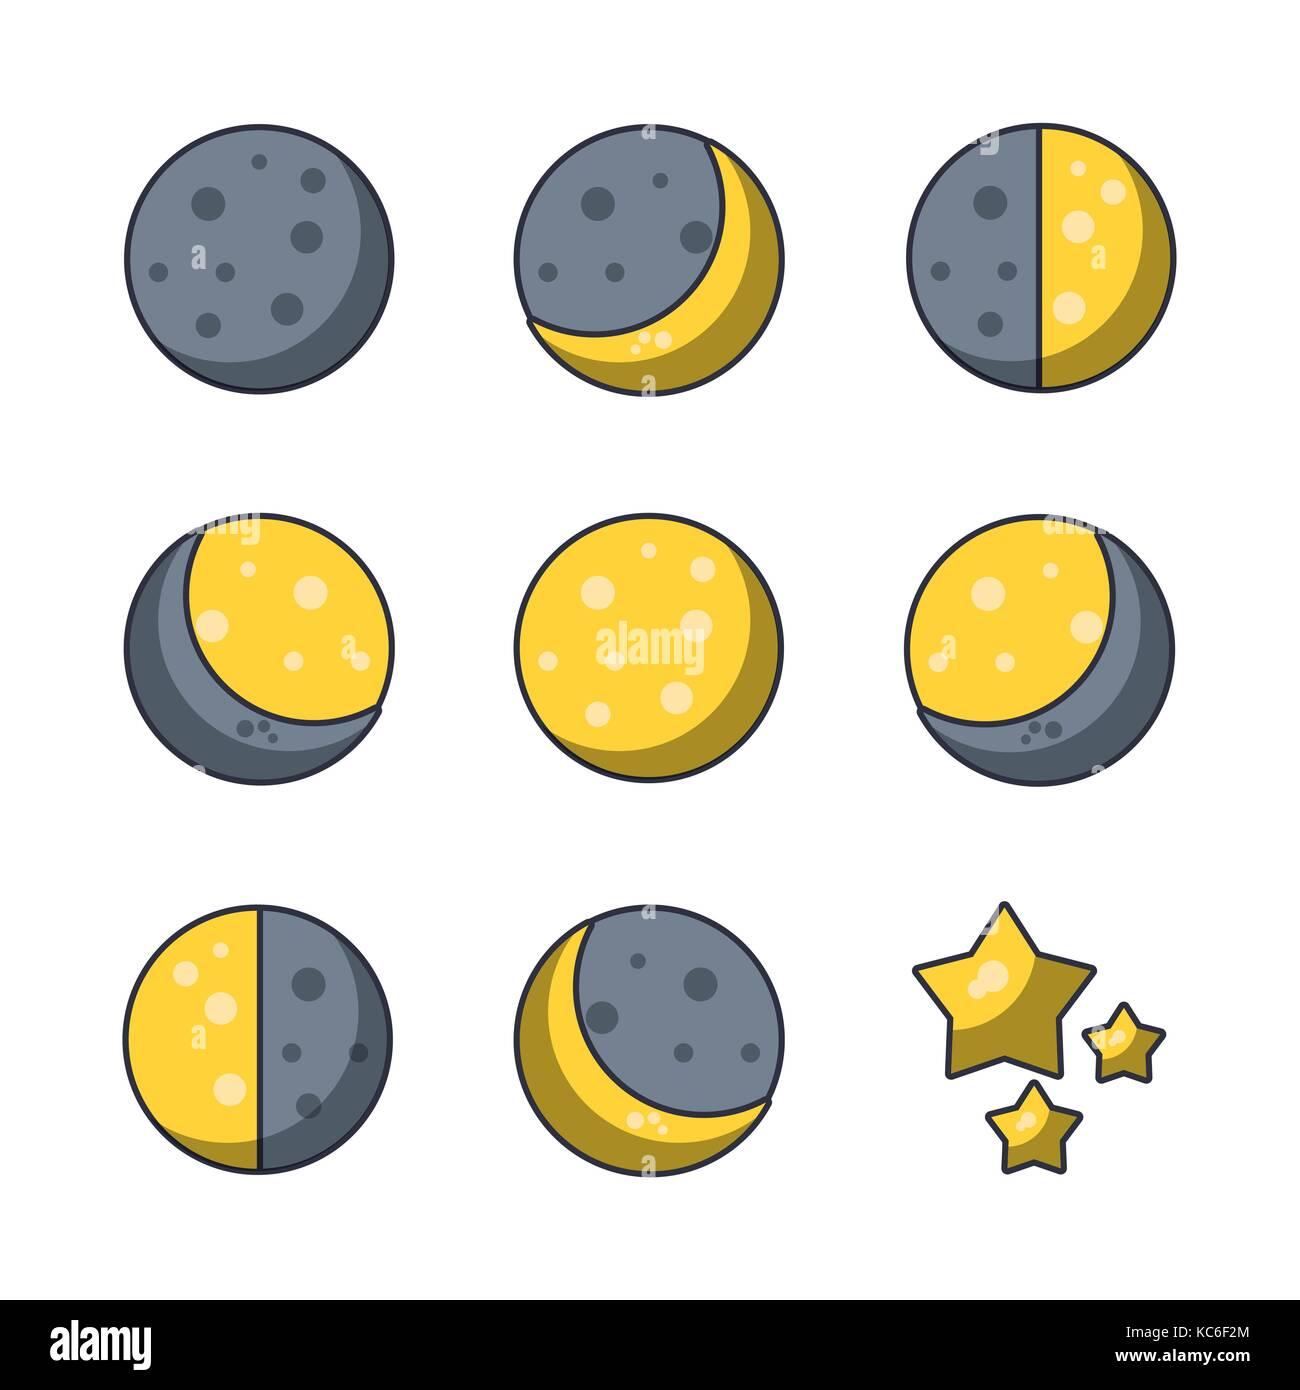 Moons icons set - Stock Image